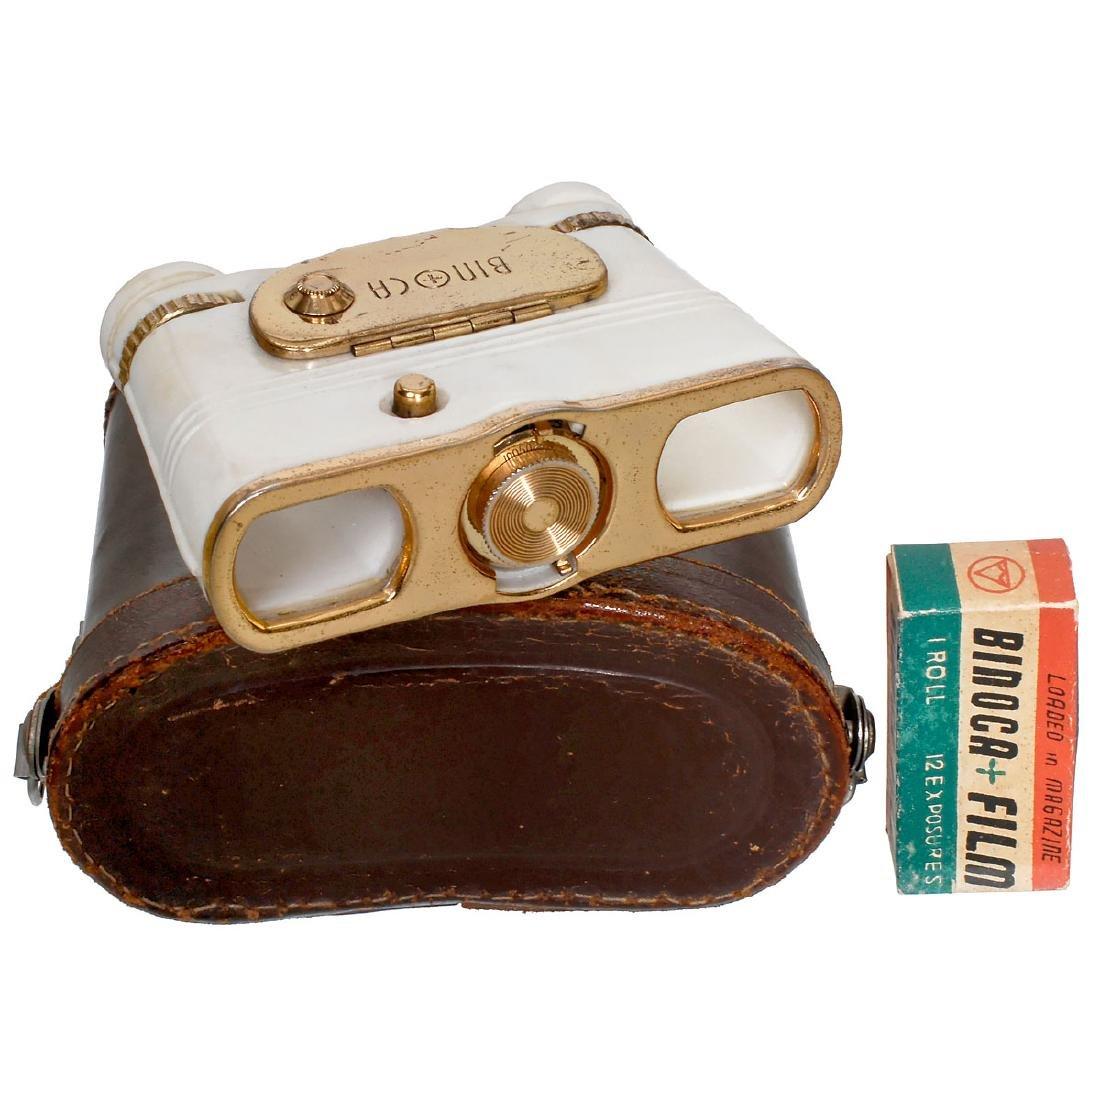 Binoca Picture Binoculars, 1950